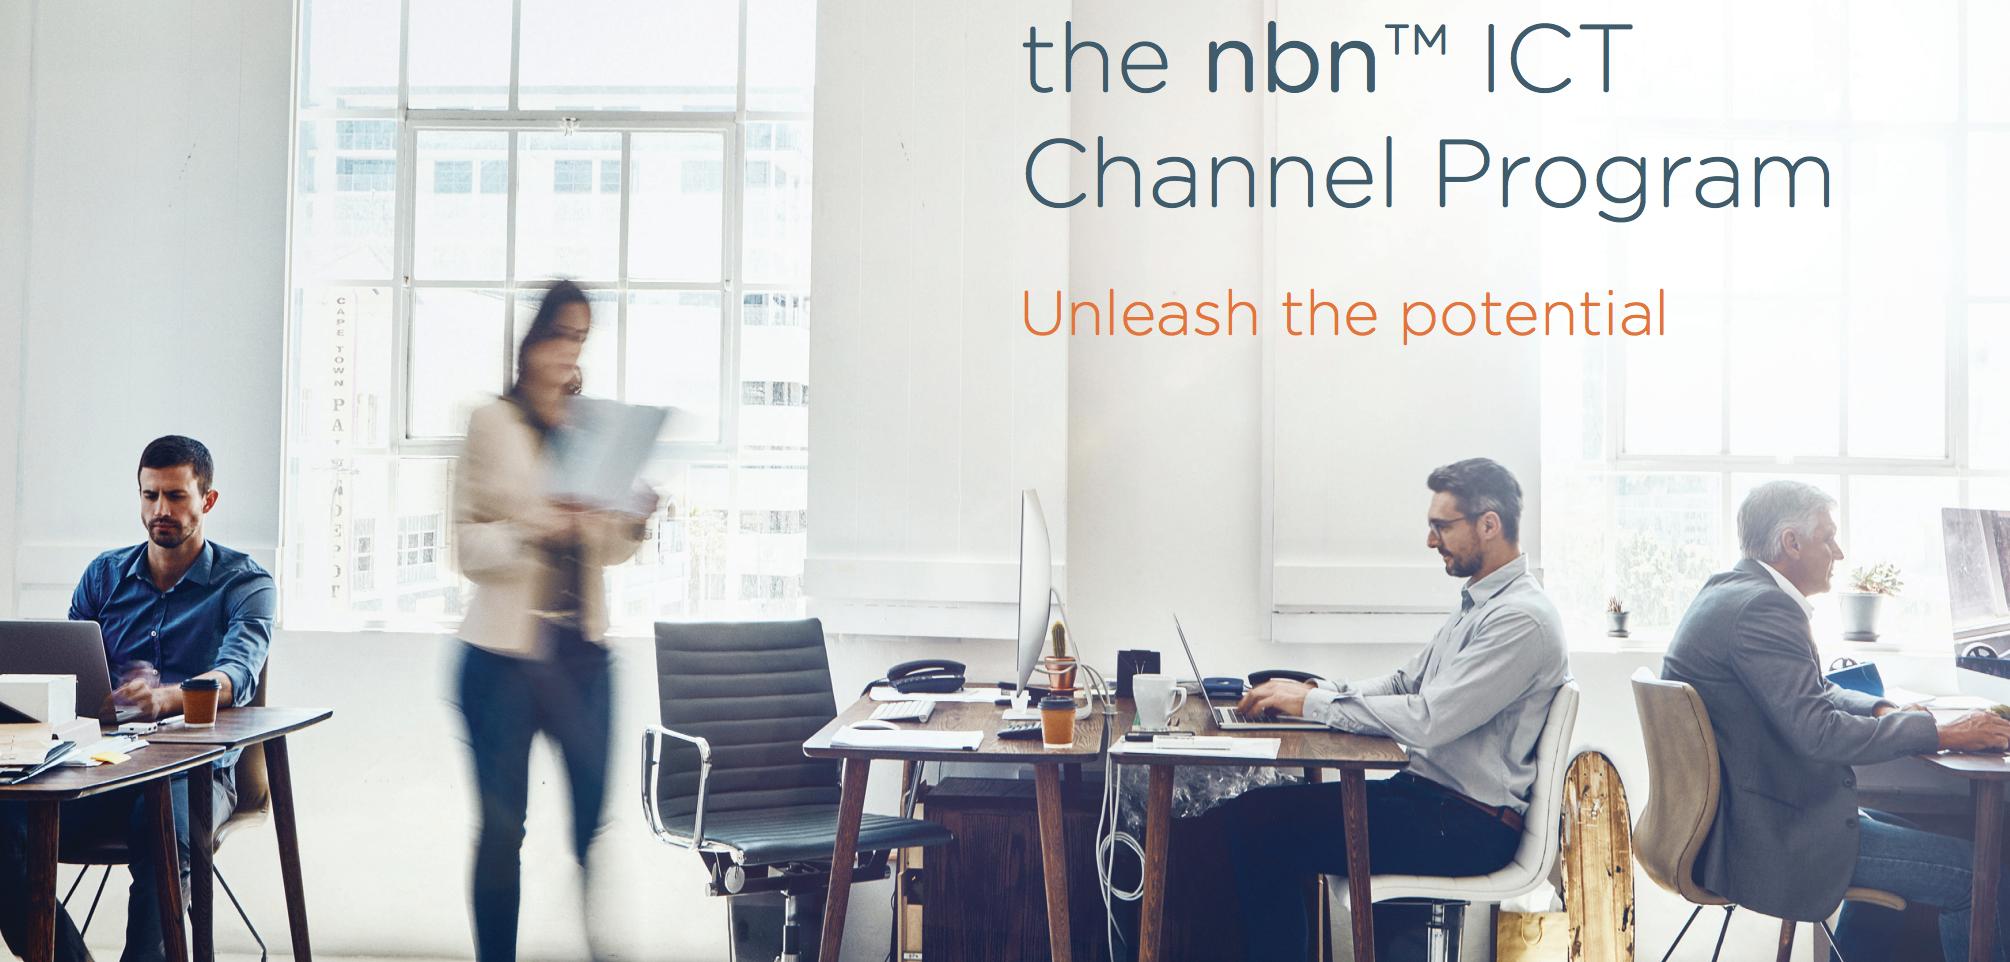 nbn ICT Channel